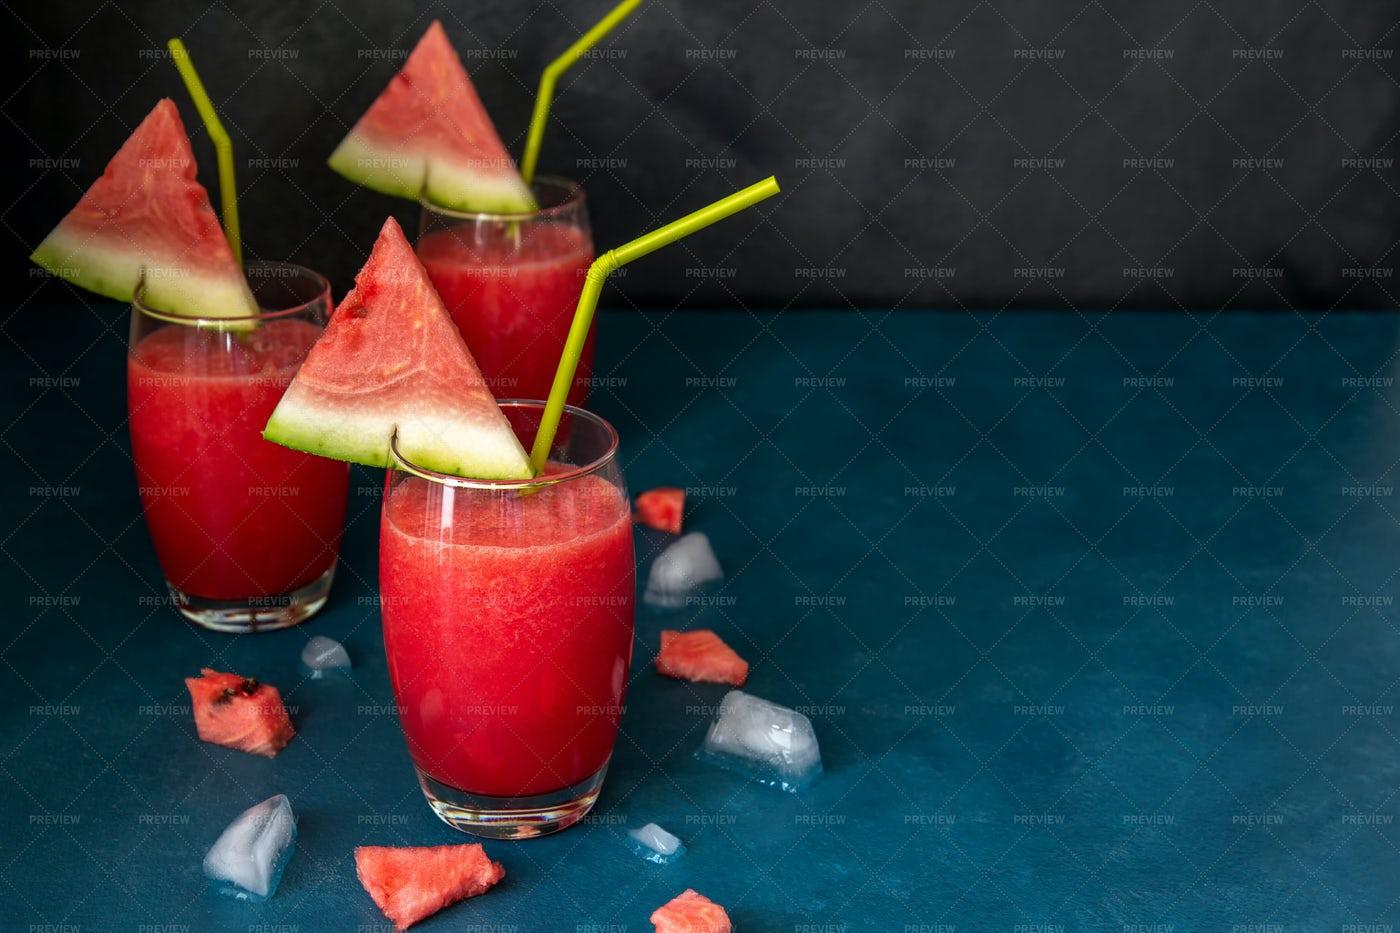 Watermelon Smoothies With Straws: Stock Photos